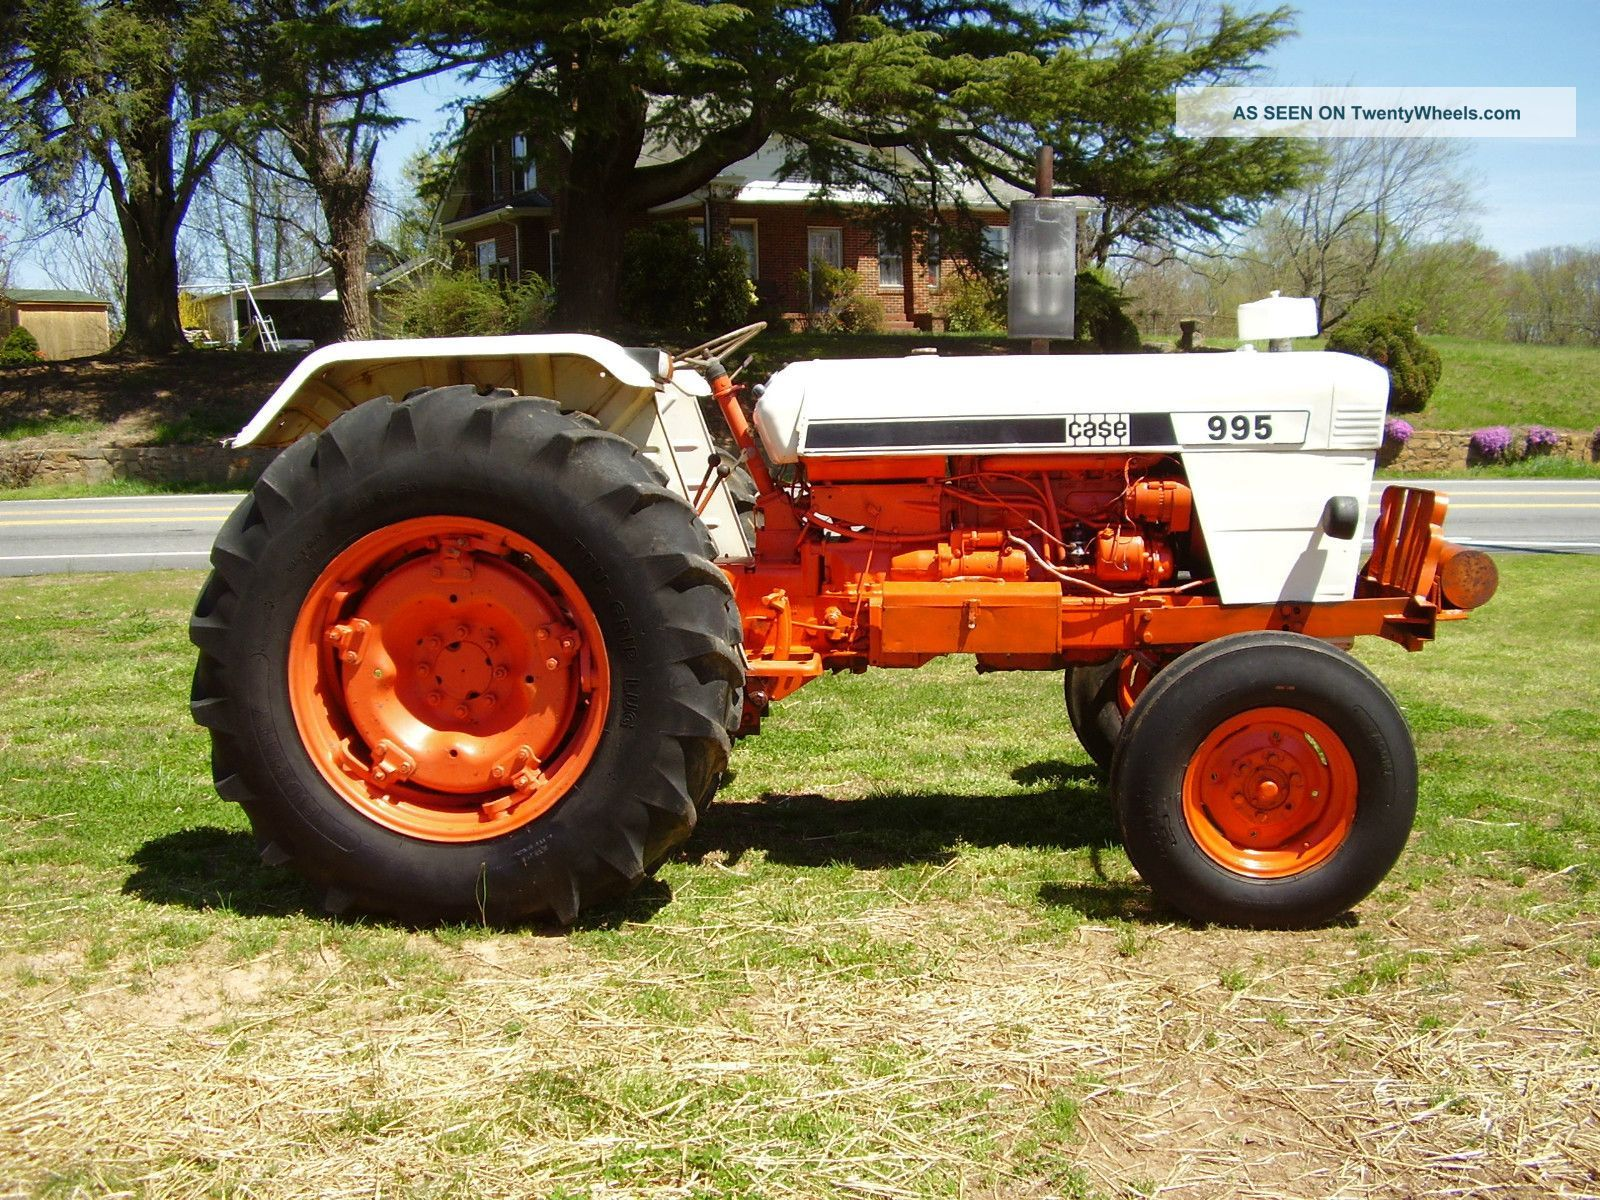 David Brown 990 Wiring Diagram Vivresaville 3 Way Outlet 995 Case 2 Wd Diesel Tractor 64 Hp Tractors